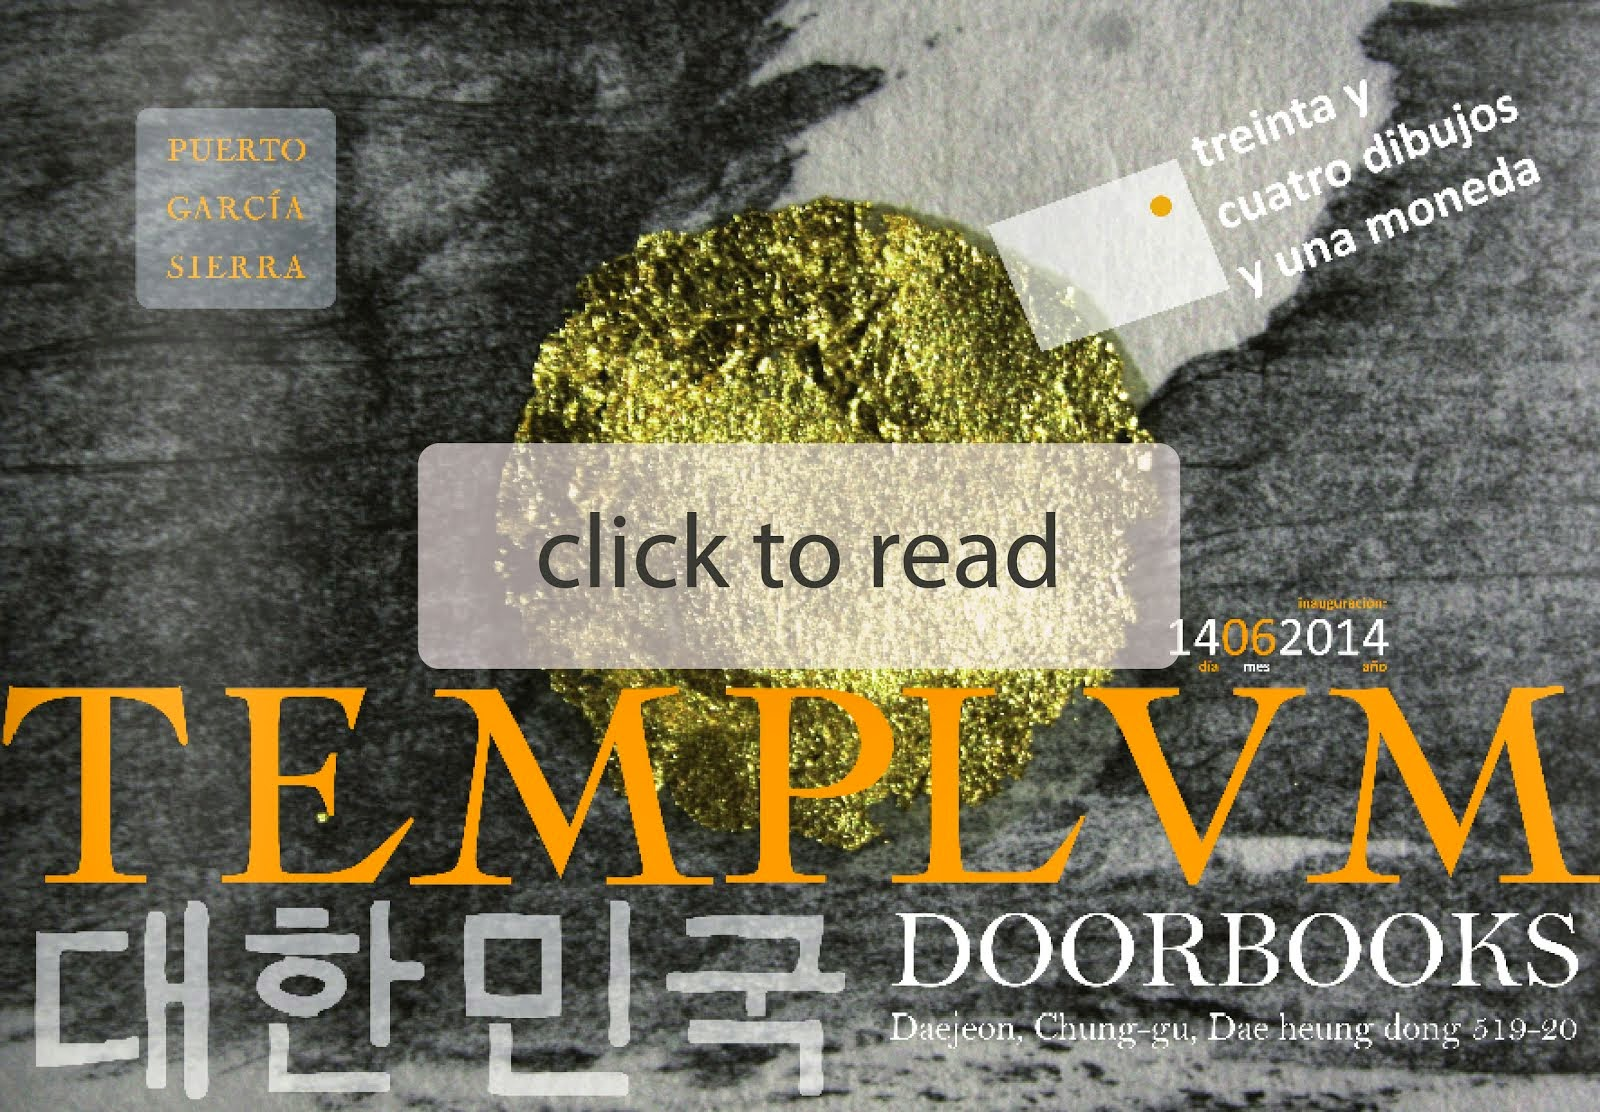 Revista Templvm Corea Daejeon